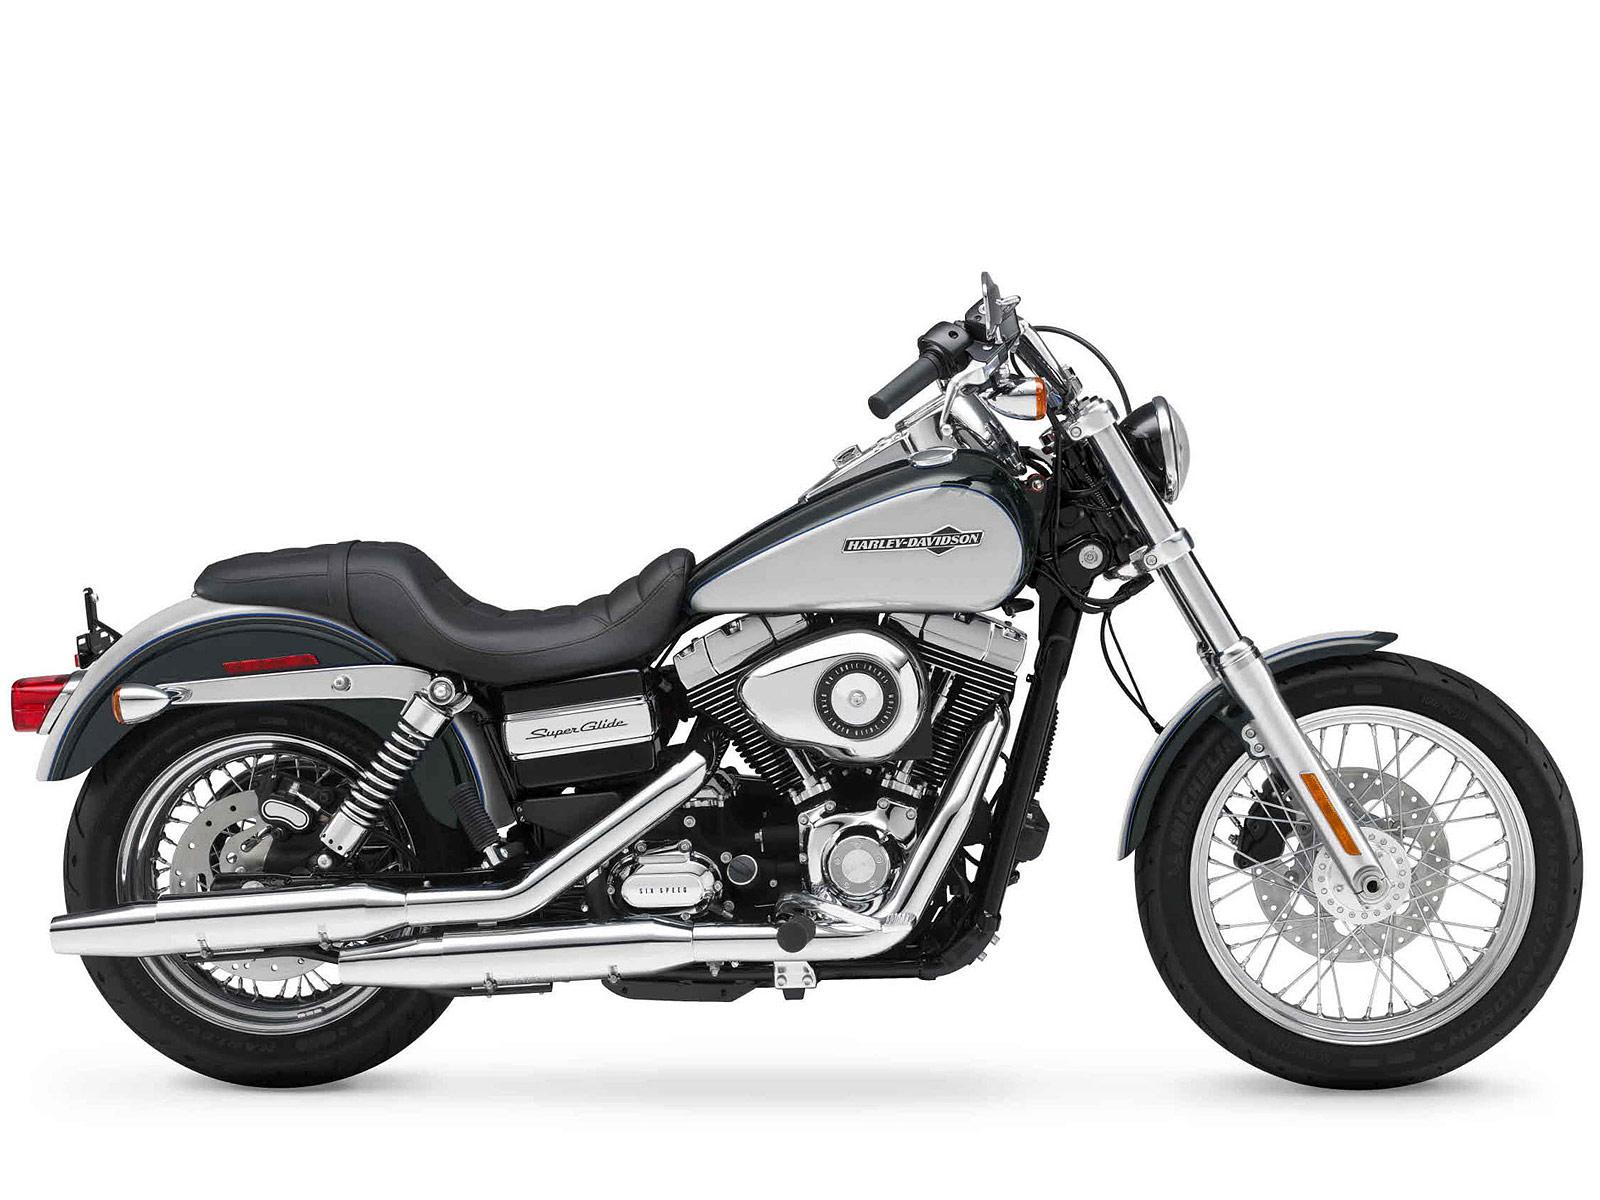 Fxdc Dyna Super Glide Custom 2007 Harley Davidson Pictures: Harley-Davidson Pictures. 2012 FXDC Dyna Super Glide Custom